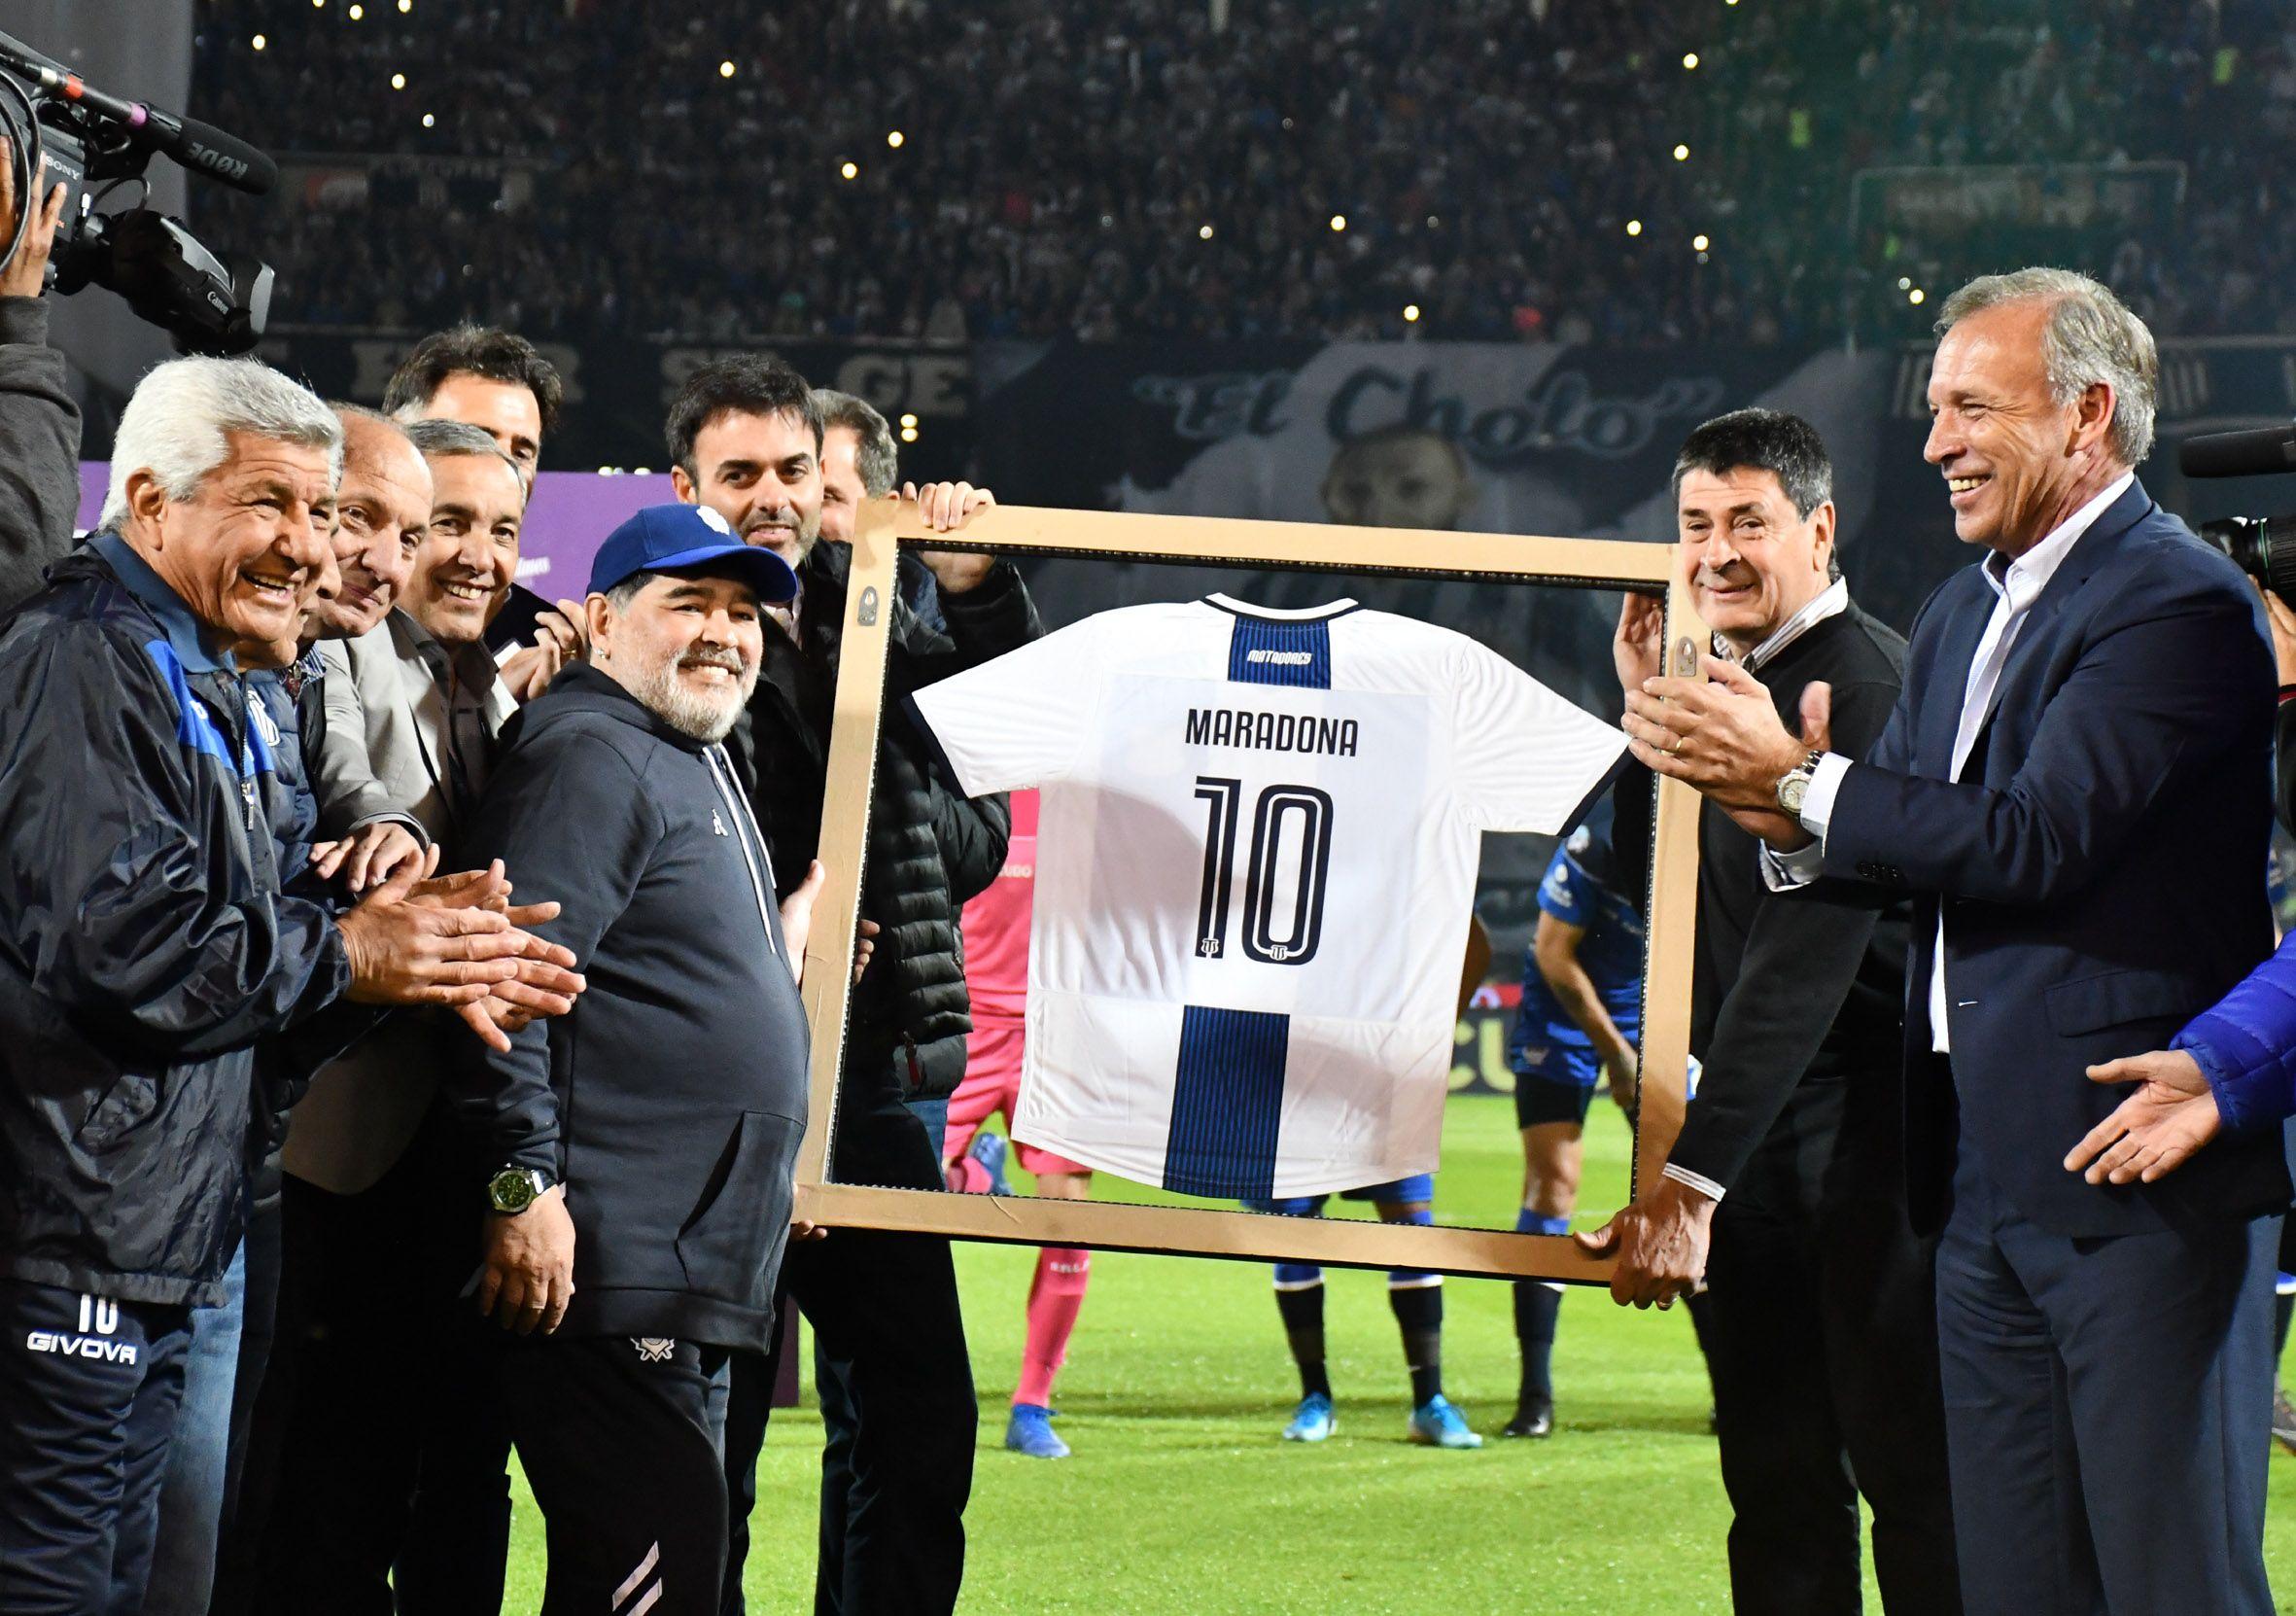 El homenaje a Diego Maradona en la cancha de Talleres de Córdoba